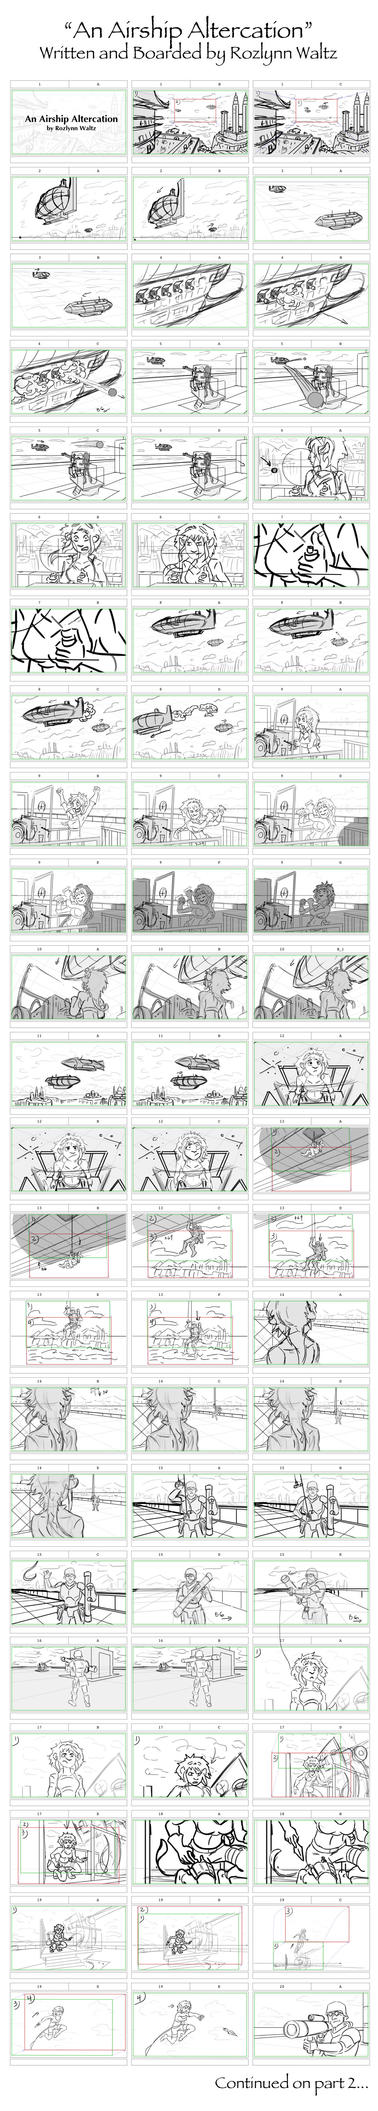 An Airship Altercation - Storyboards - Part 1 by RozlynnWaltz